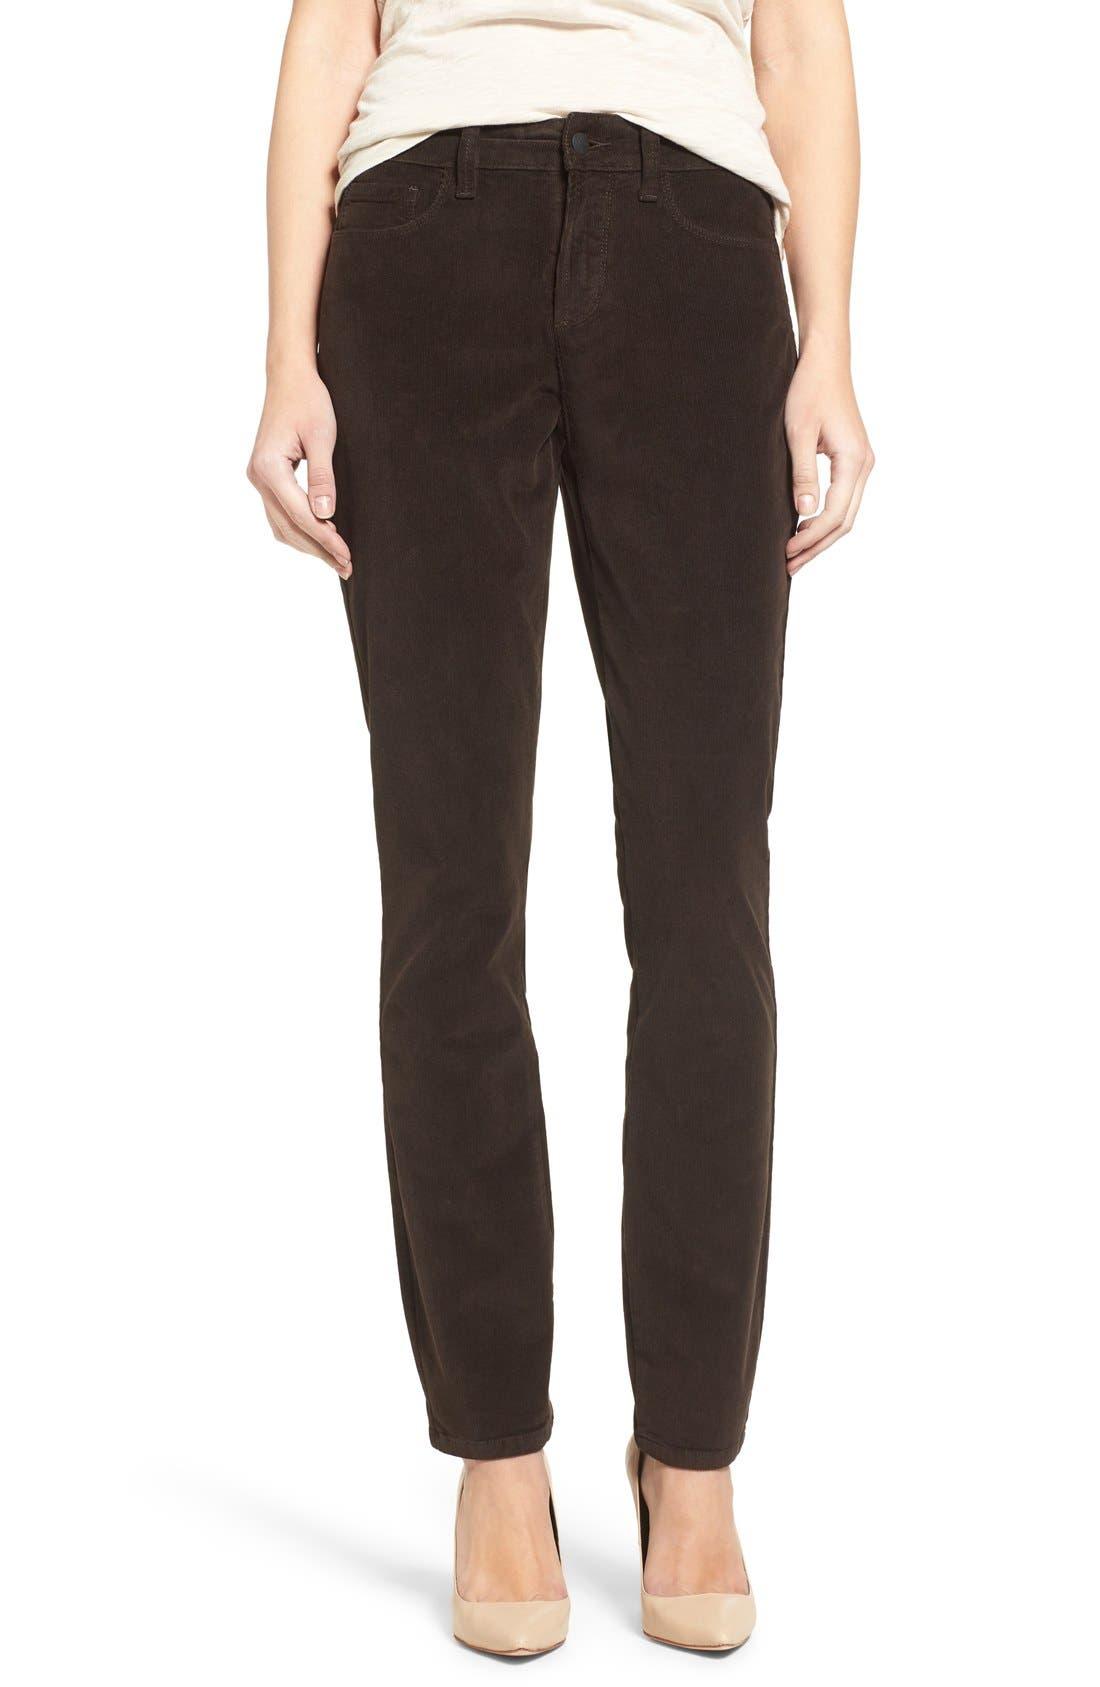 Main Image - NYDJ 'Alina' Skinny Stretch Corduroy Pants (Regular & Petite)